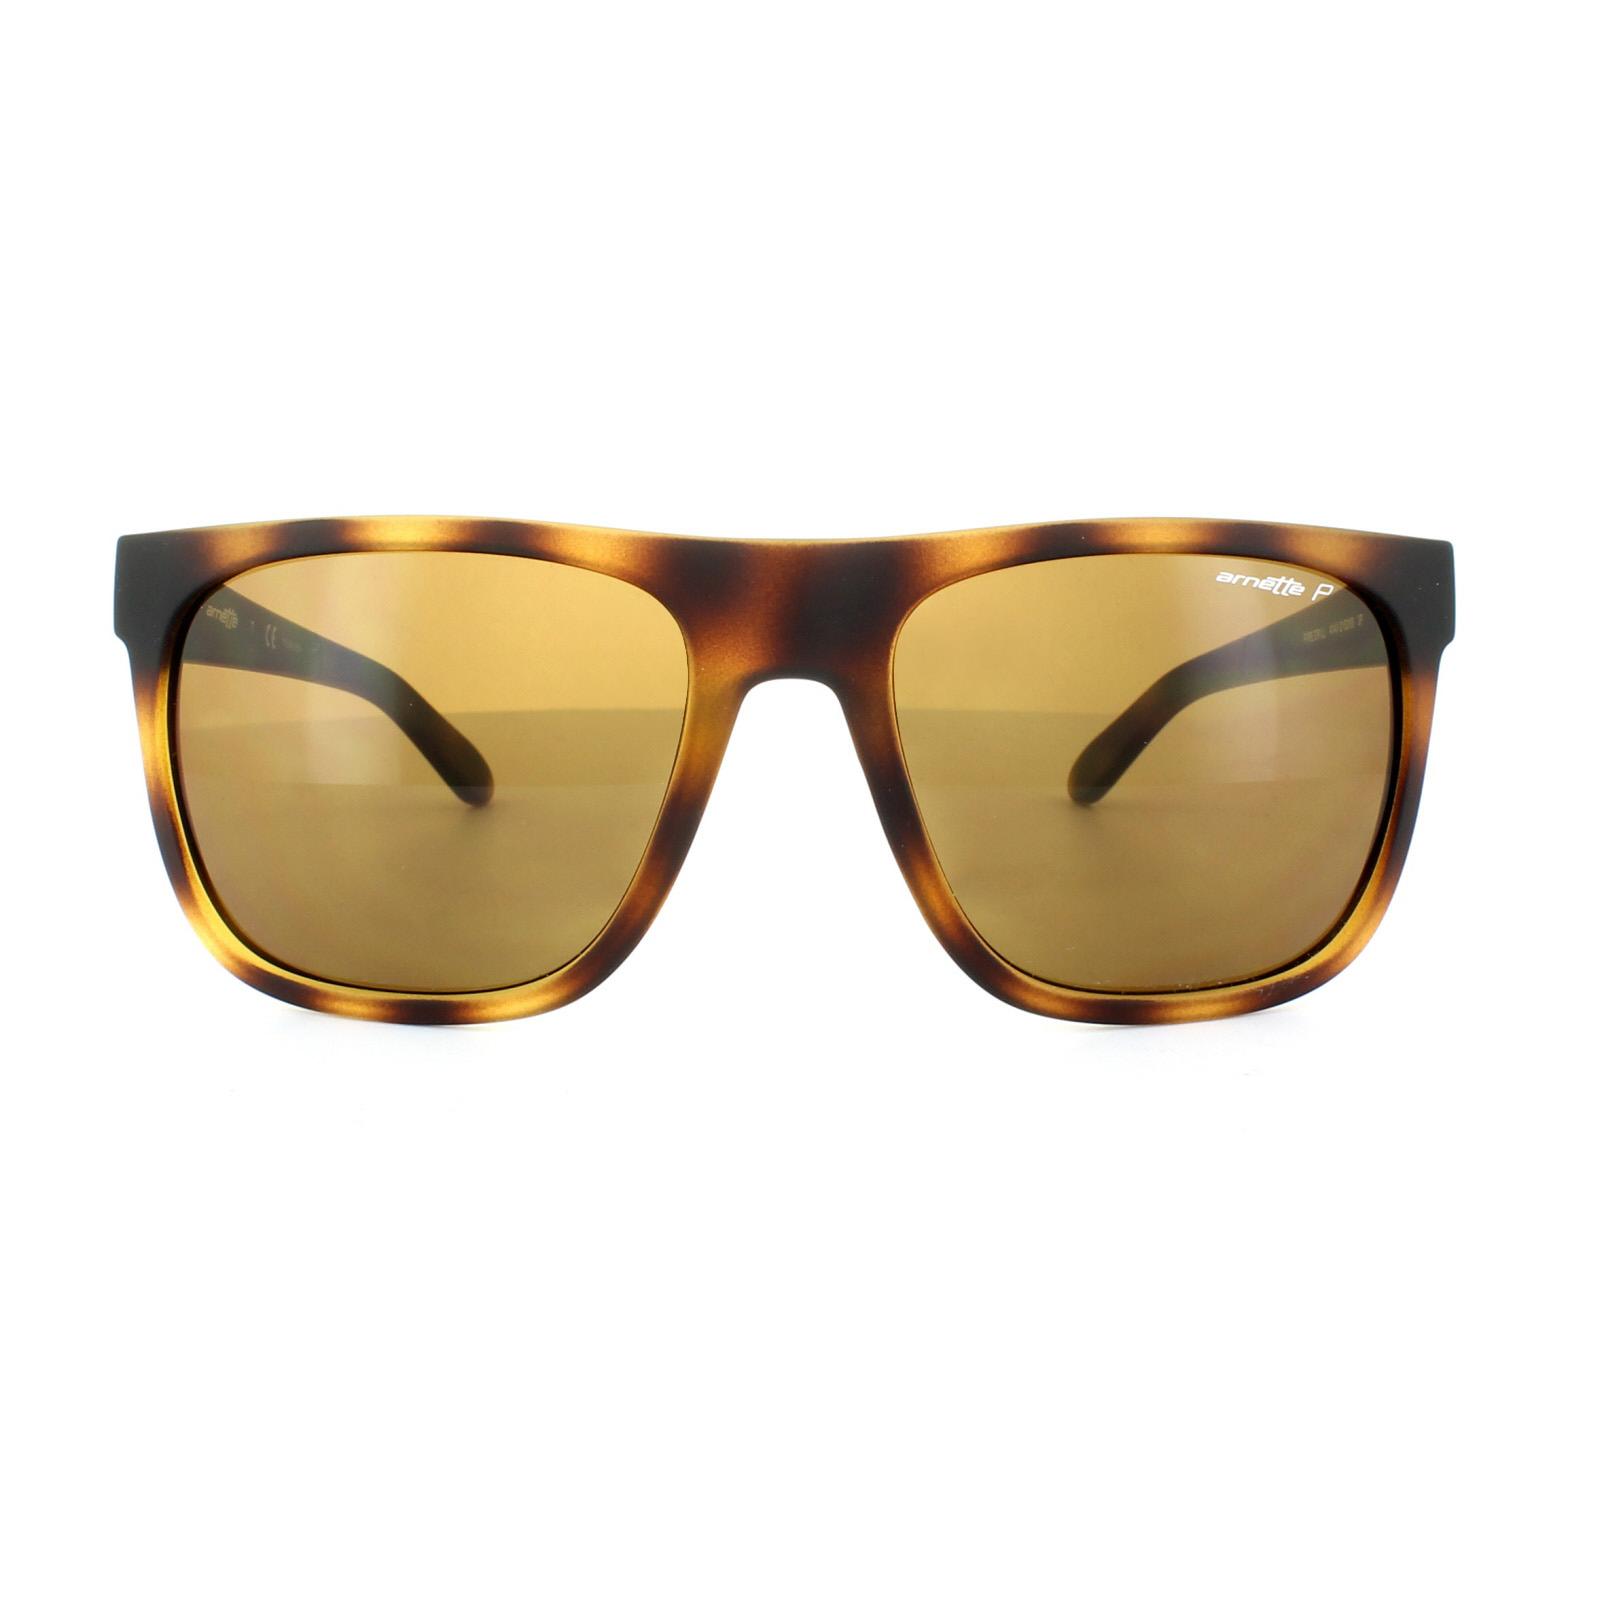 6097ccd4bf91 Sentinel Arnette Sunglasses 4143 Fire Drill 215283 Fuzzy Havana Brown  Polarized